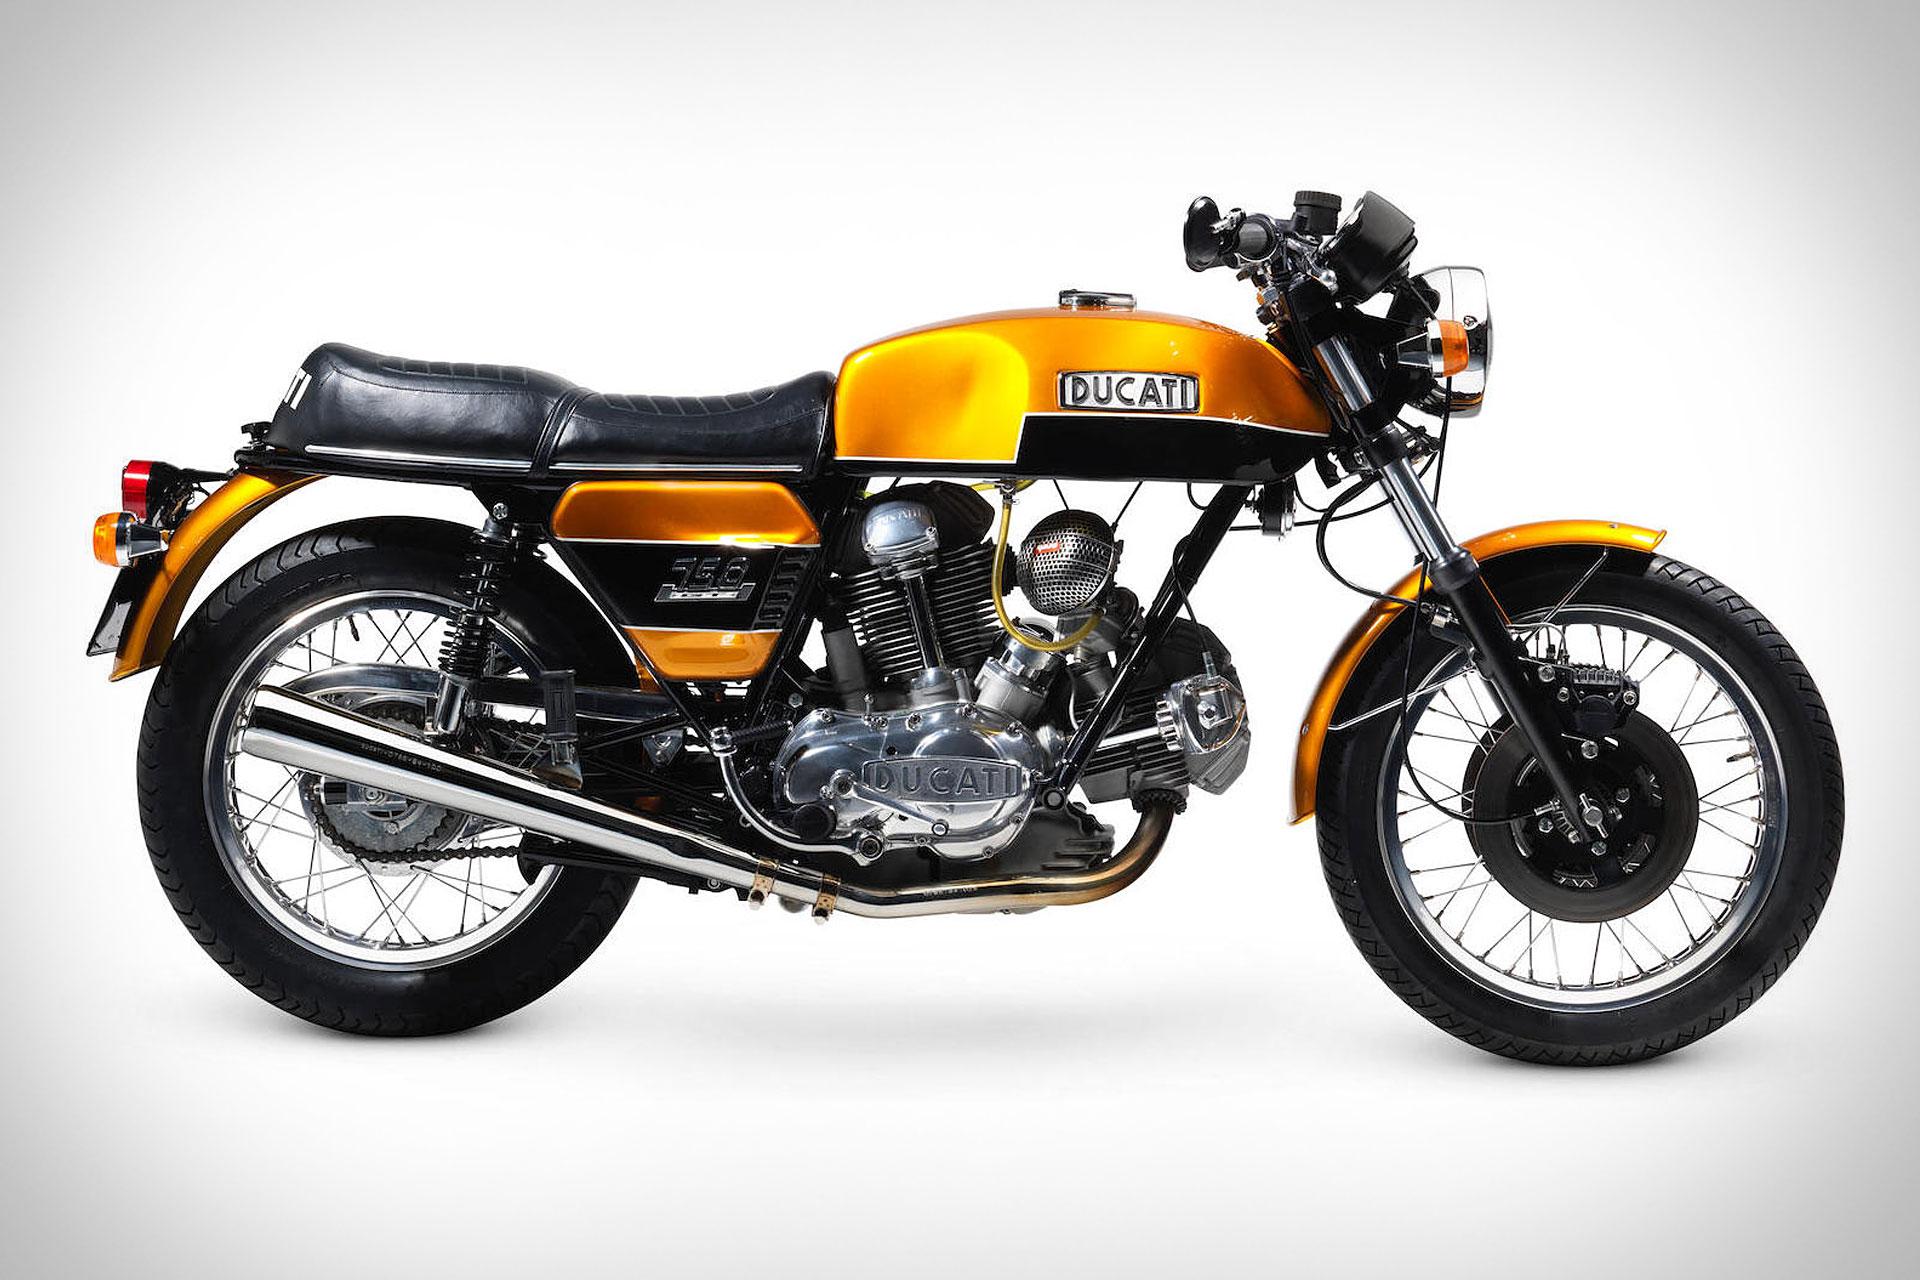 1974 ducati 750 gt motorcycle uncrate. Black Bedroom Furniture Sets. Home Design Ideas